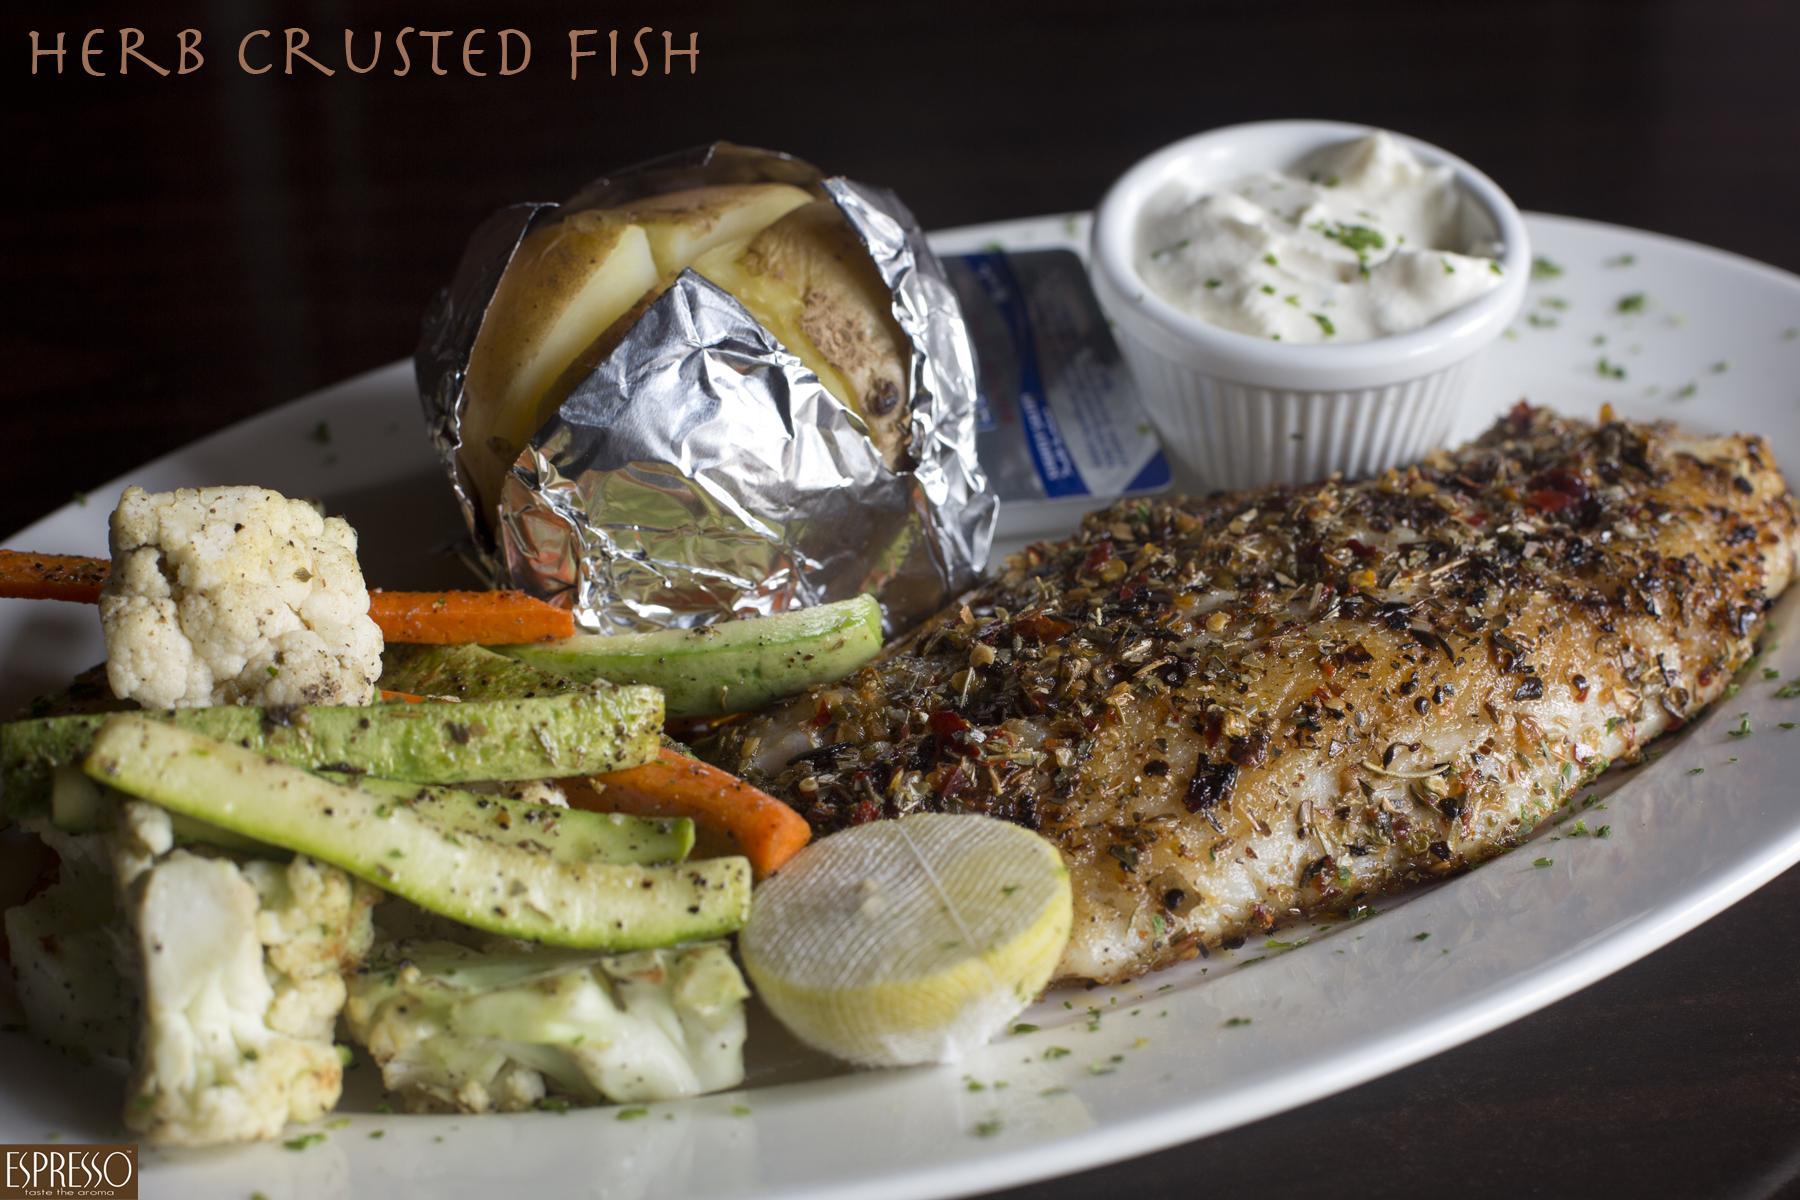 Herb crusted fish2.jpg